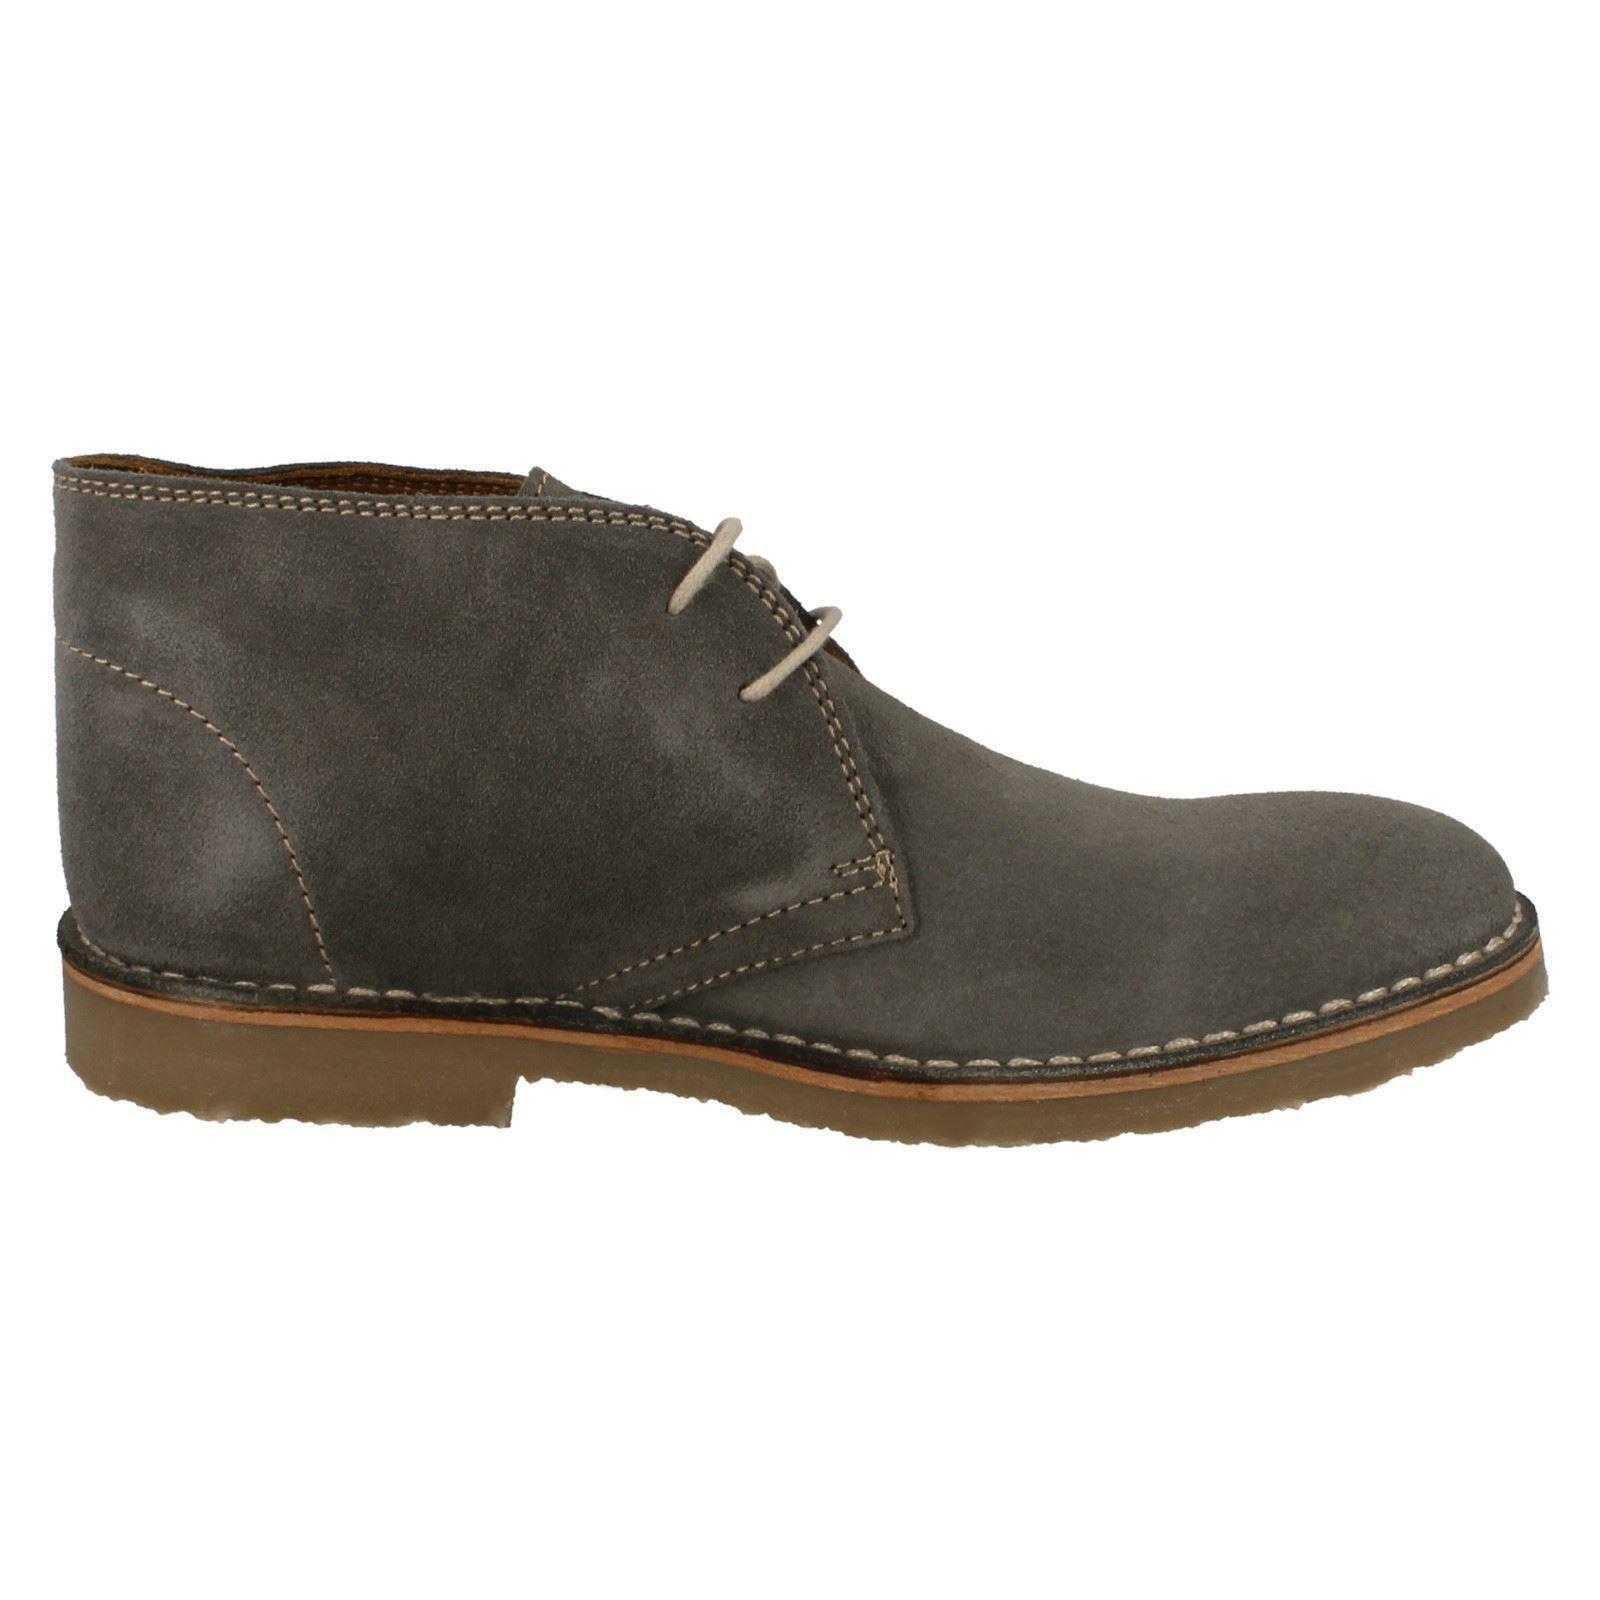 Mens Loake Desert Style Suede Kalahari Boots Kalahari Suede 6629ed